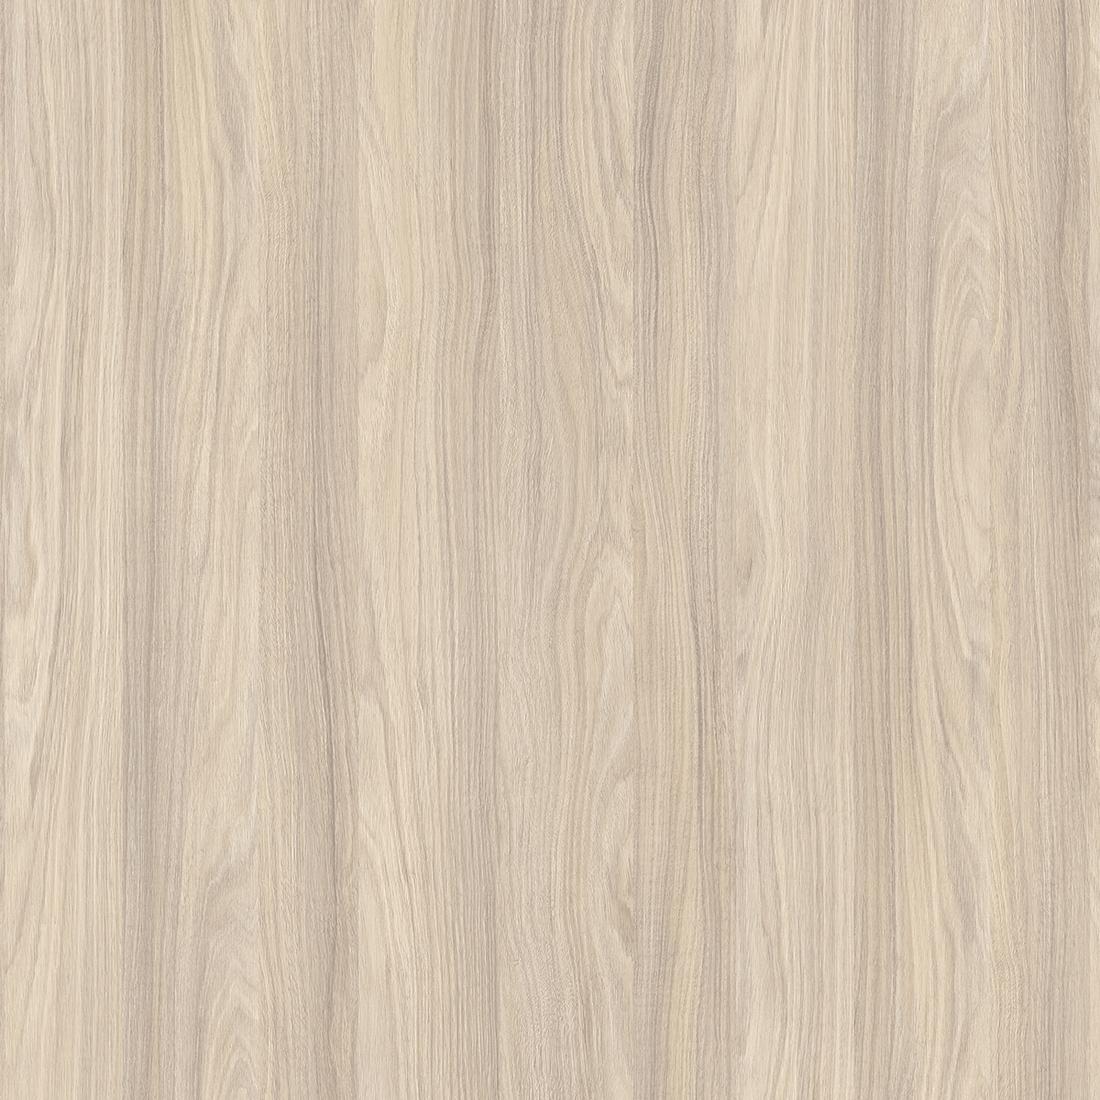 K022SN - Satin Blackwood